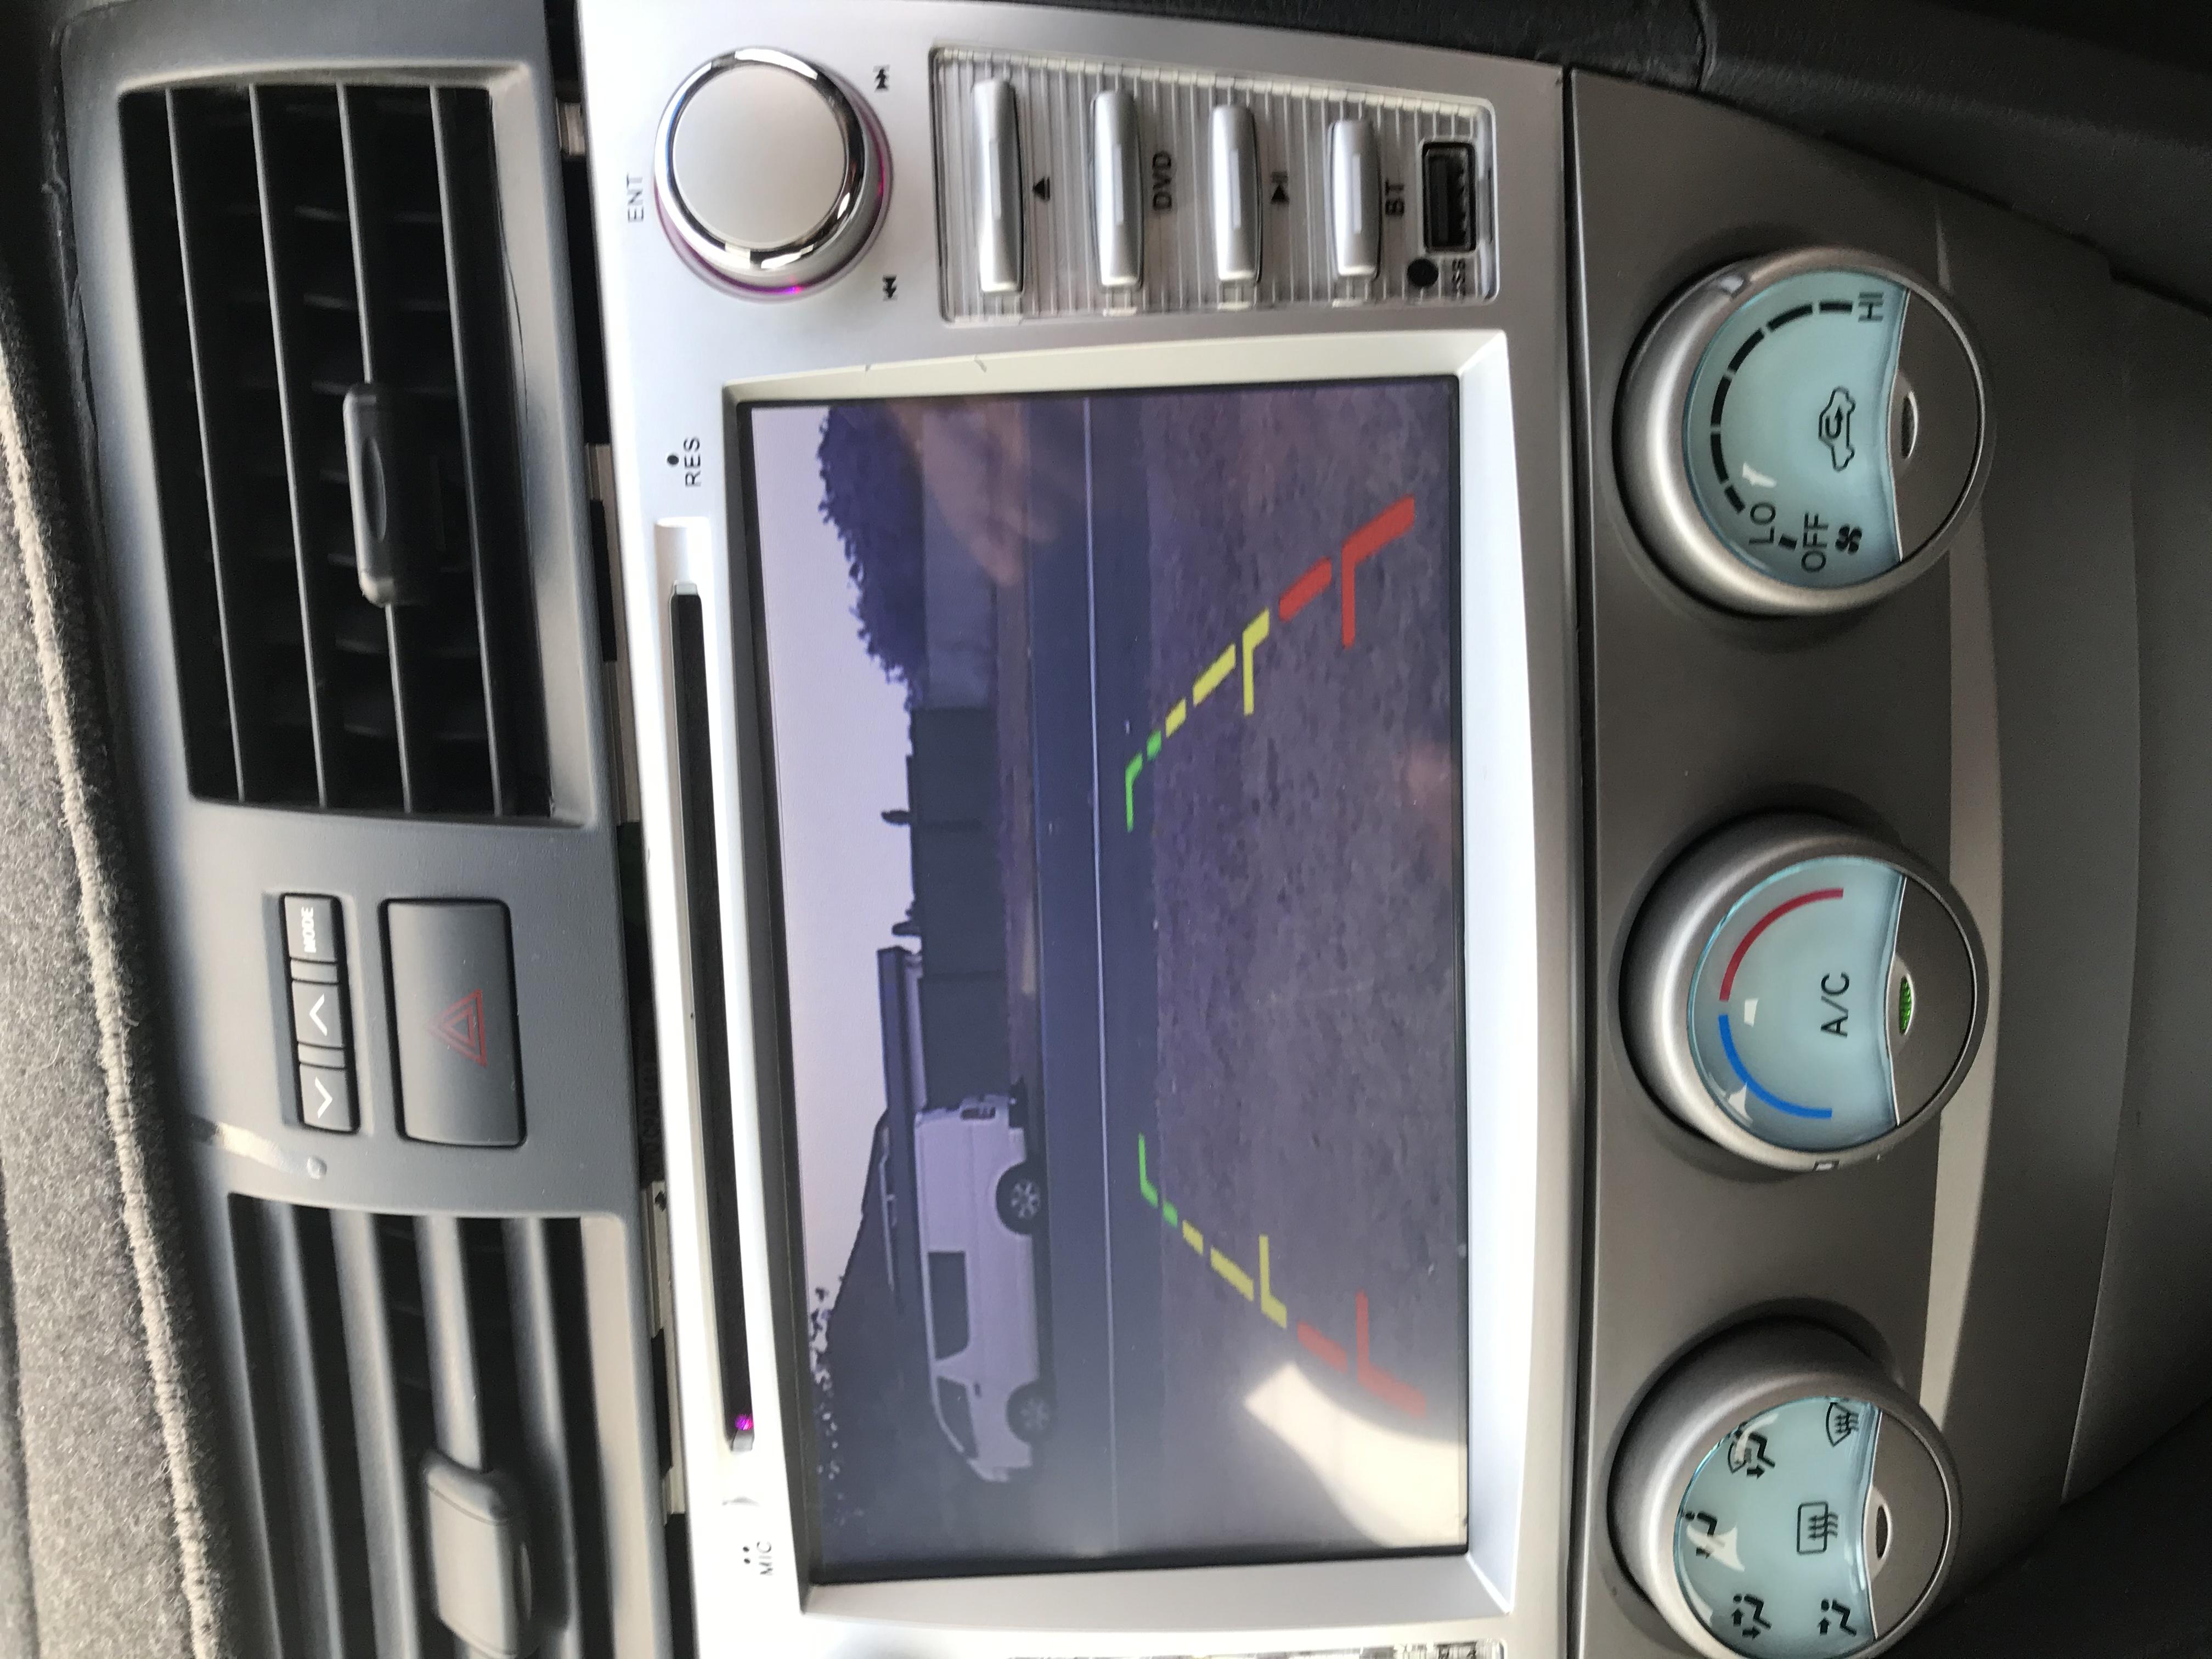 2008 1 year rego kms 135 2key logbook GPS reverse camera Bluetooth. 4 Cylinder